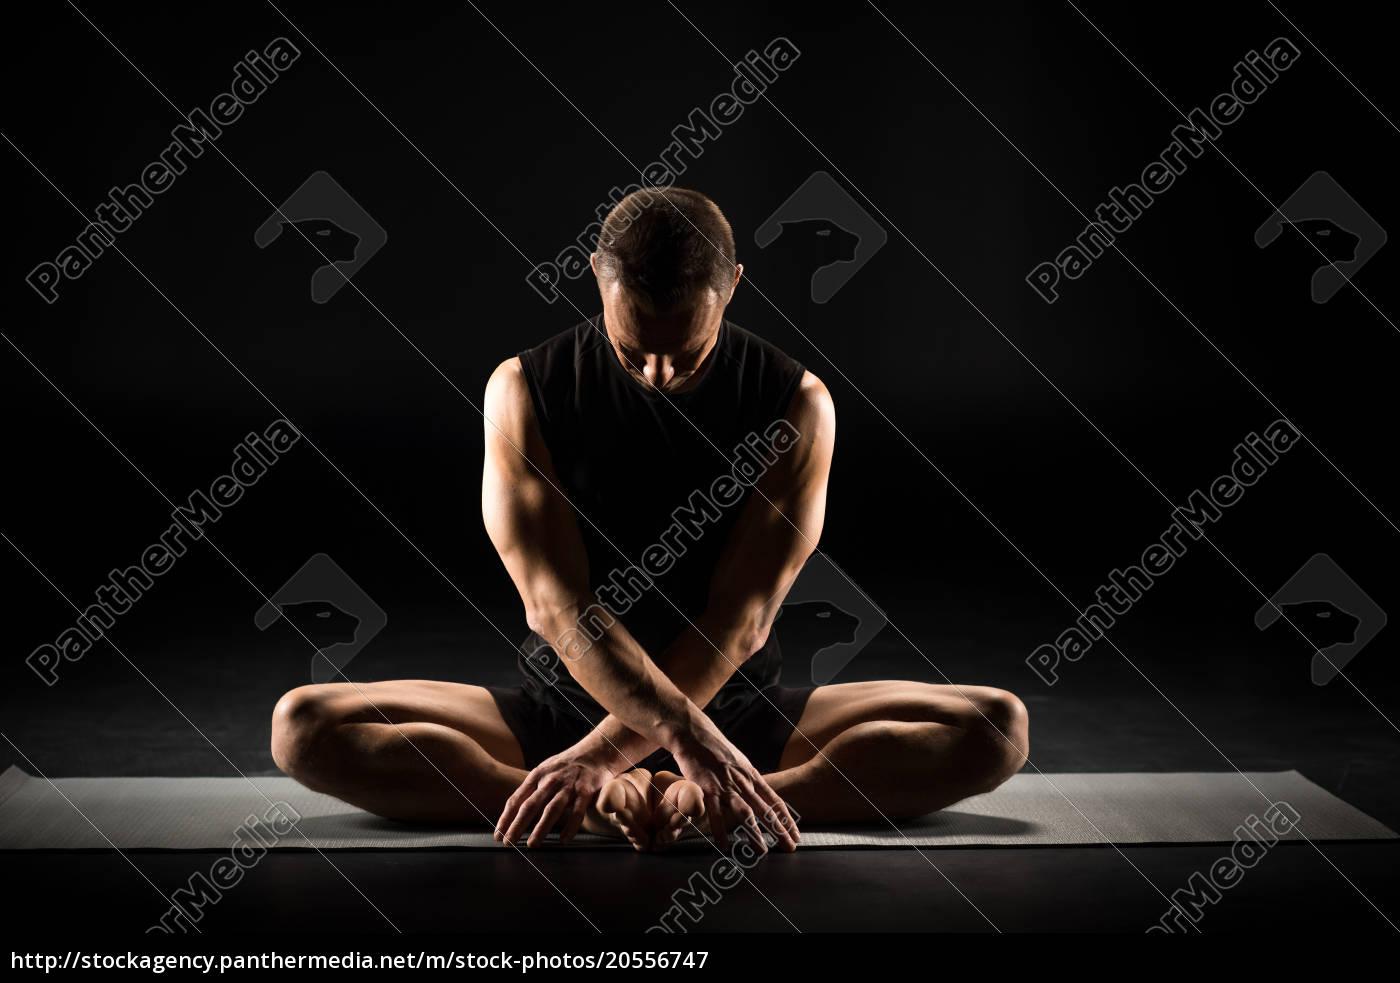 man, sitting, in, yoga, position - 20556747